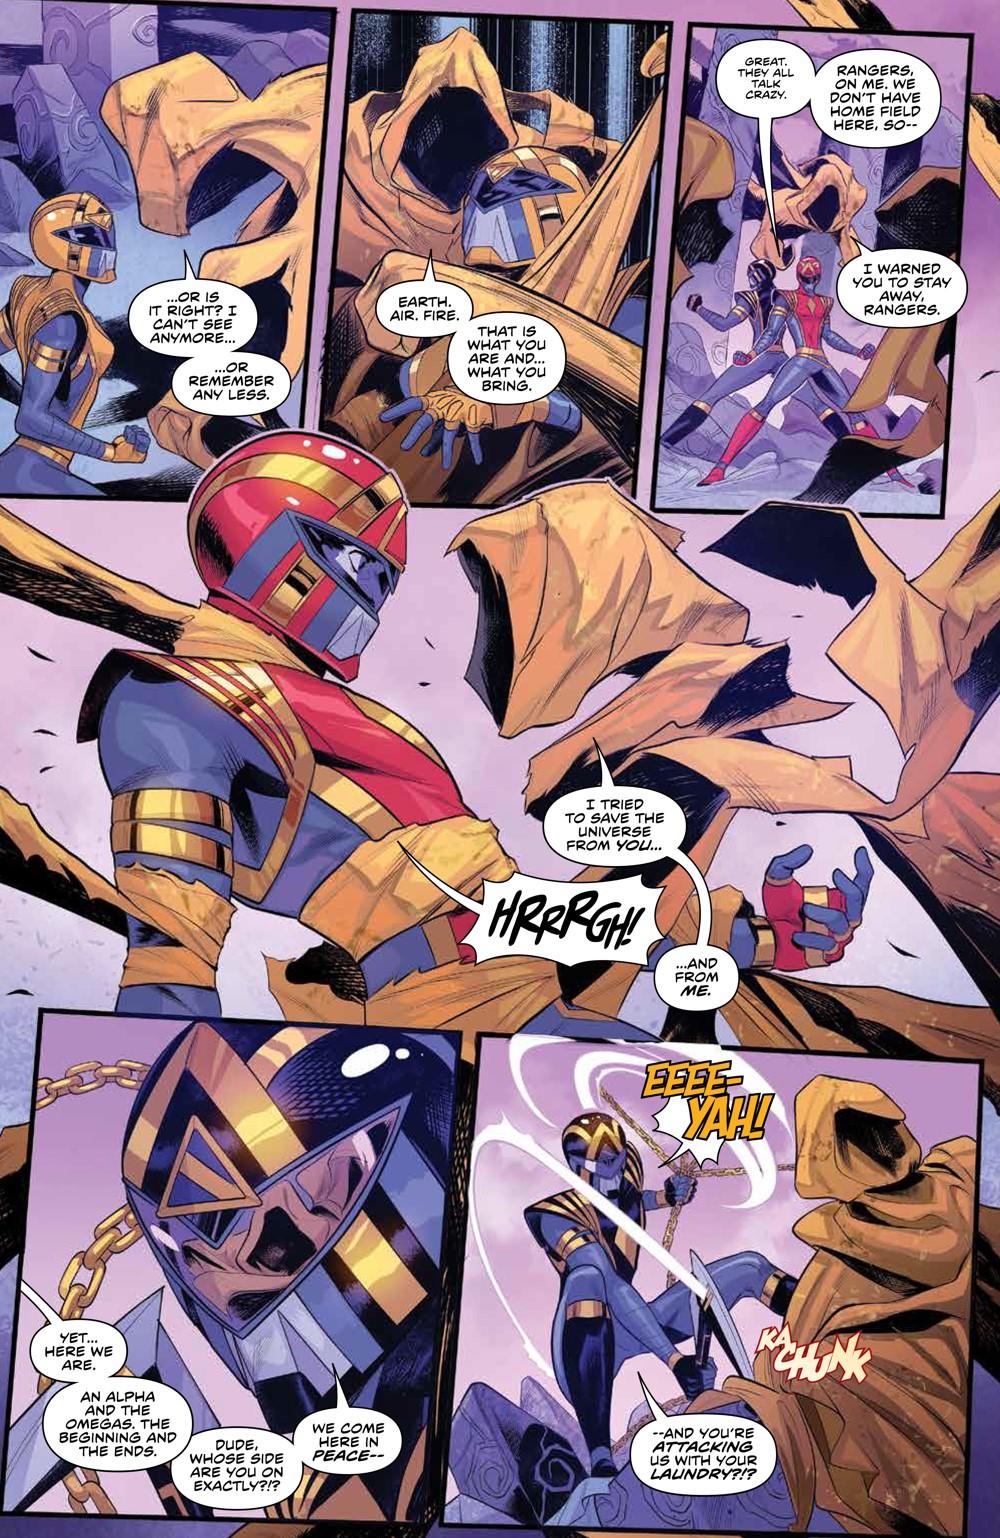 PowerRangers_011_PRESS_6 ComicList Previews: POWER RANGERS #11